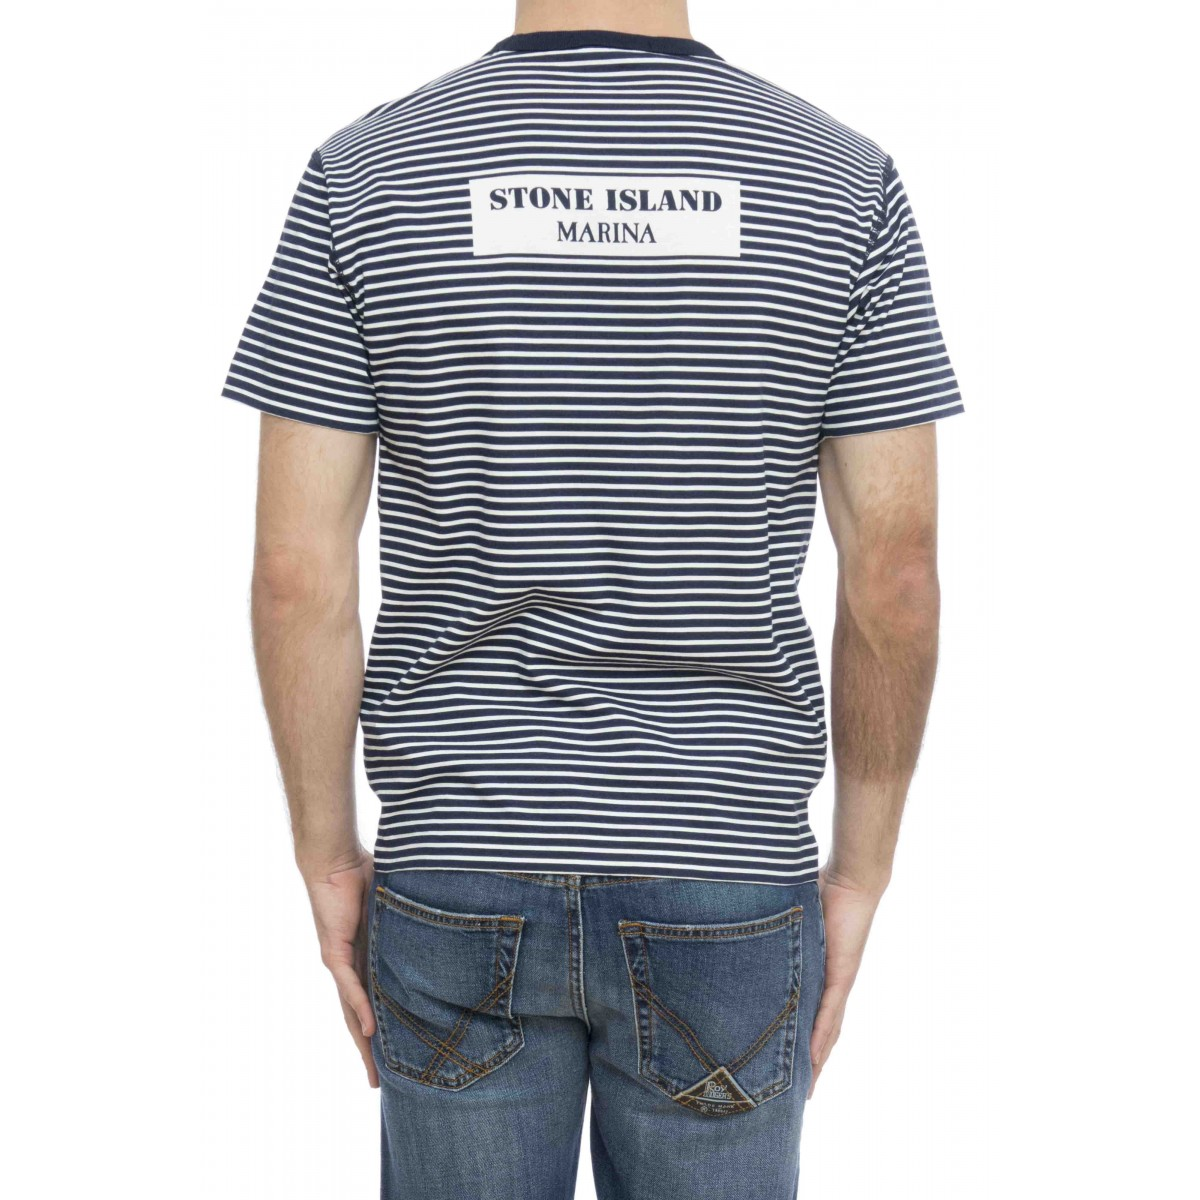 T-shirt uomo - 233x9 t-shirt marina